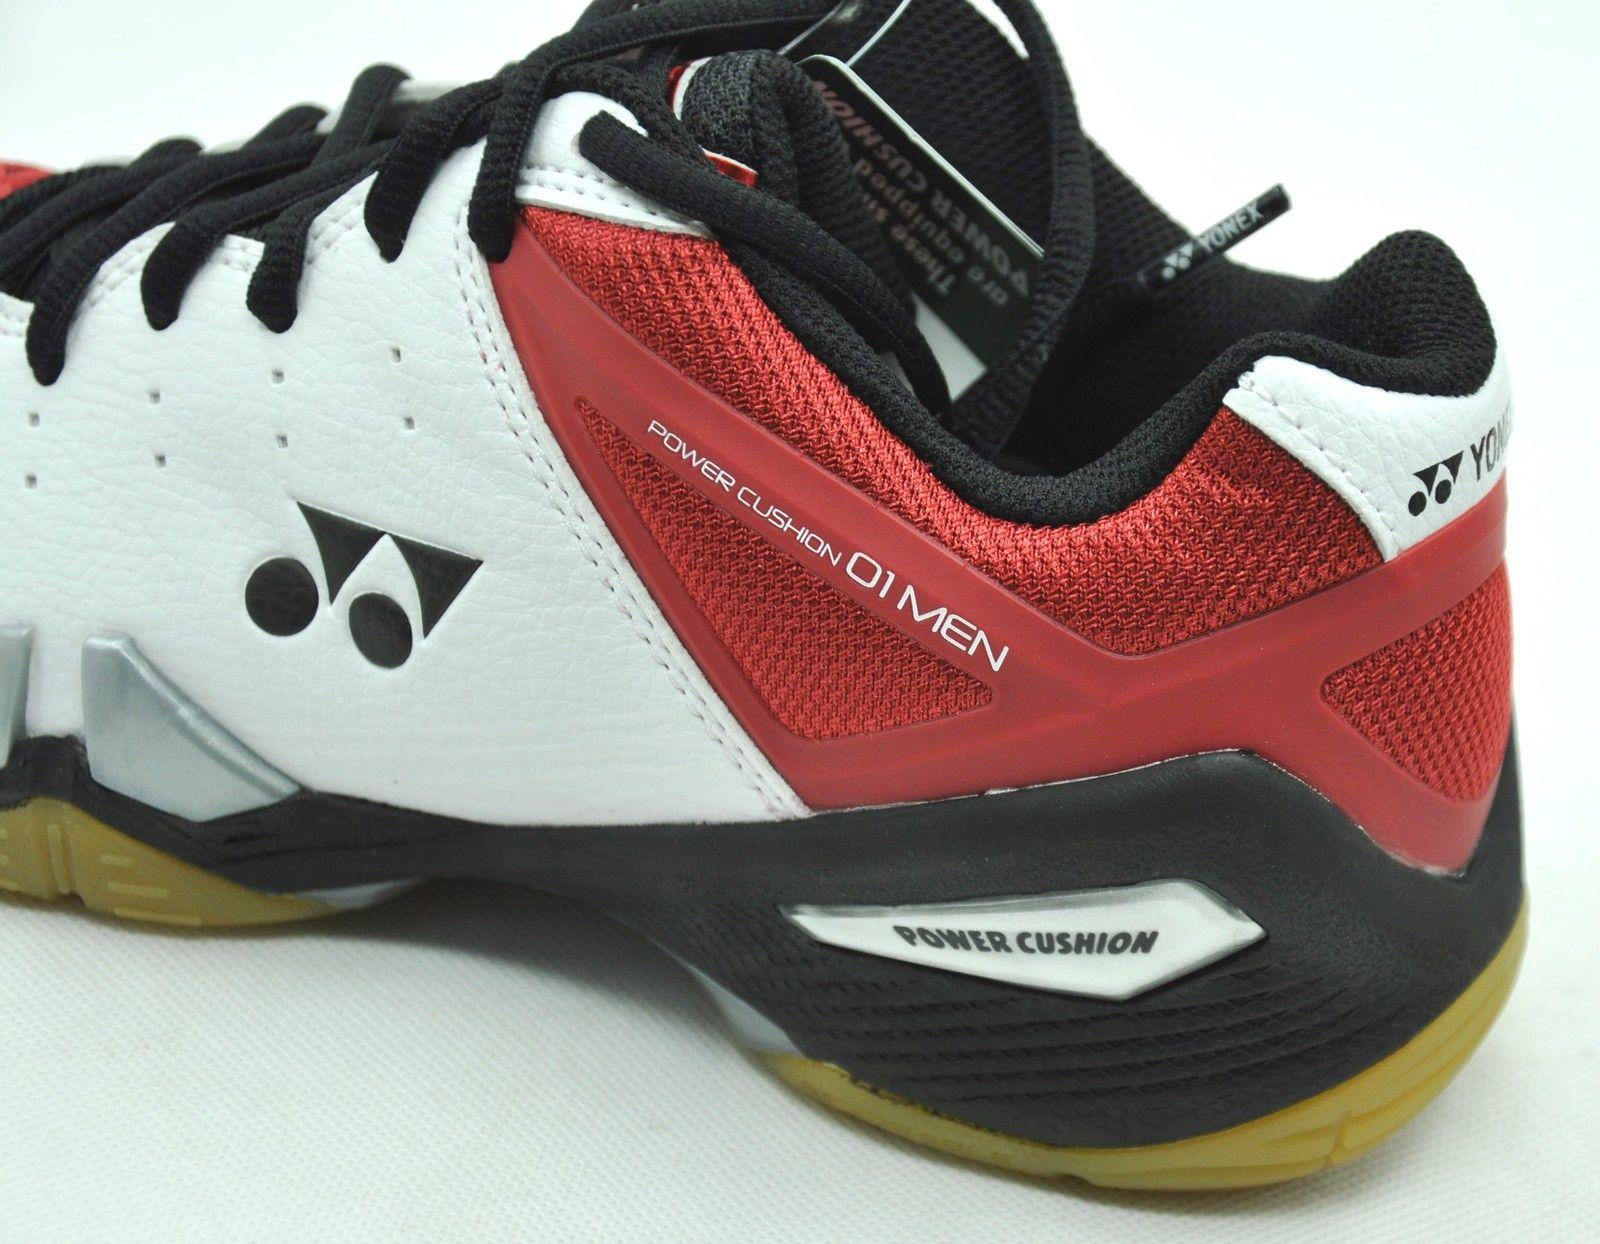 Yonex Badminton Shoes 2013 Yonex SHB 01 MX - Badm...